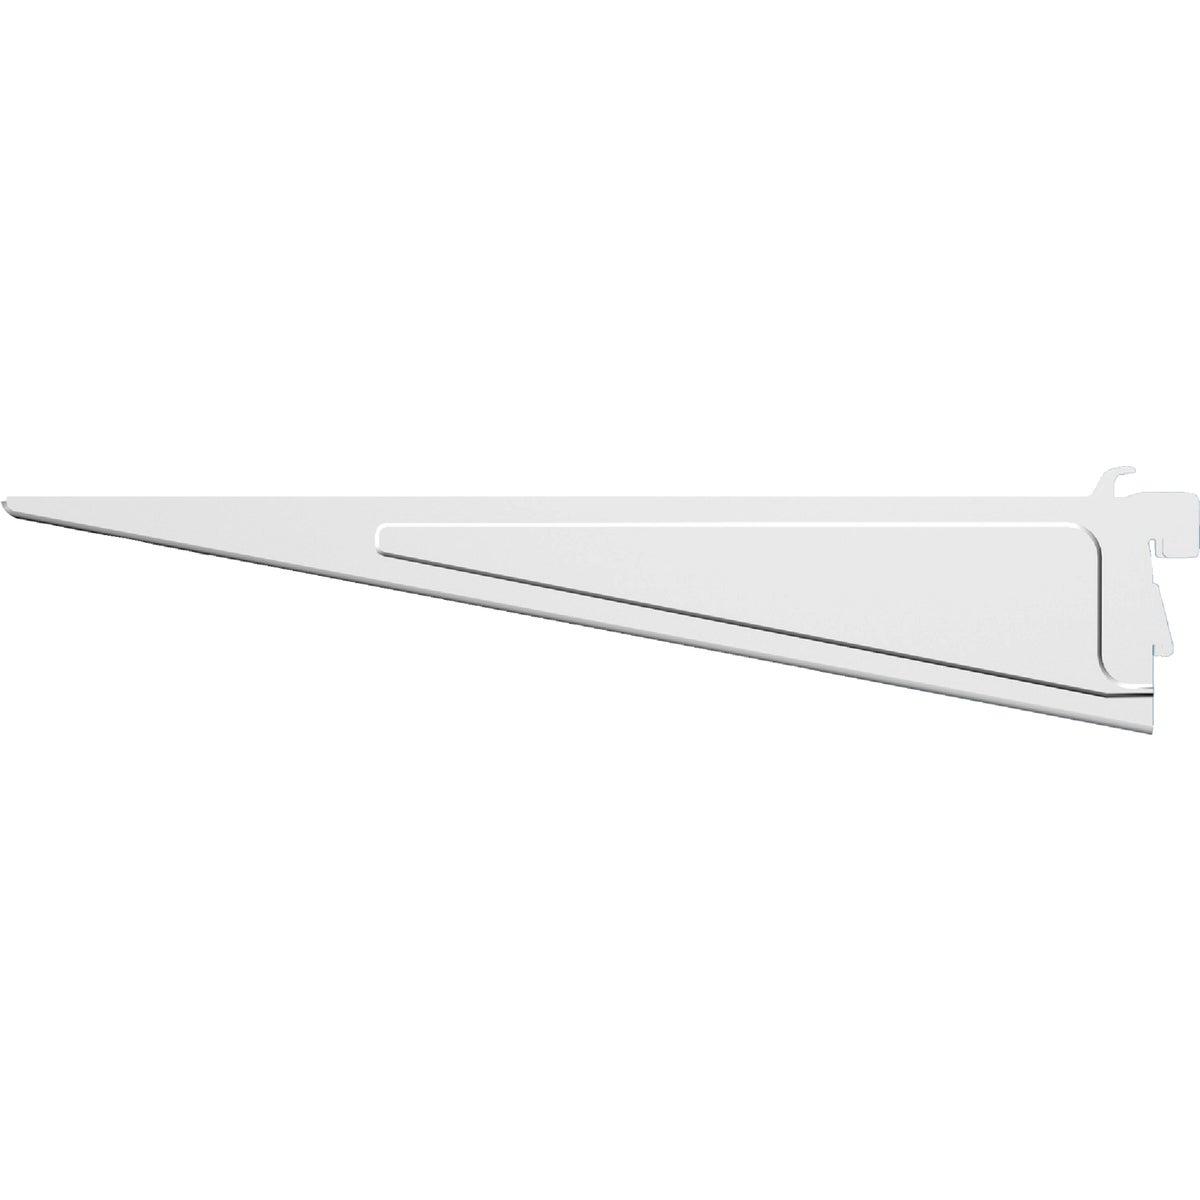 Closetmaid ShelfTrack 12 In. White Shelf Bracket